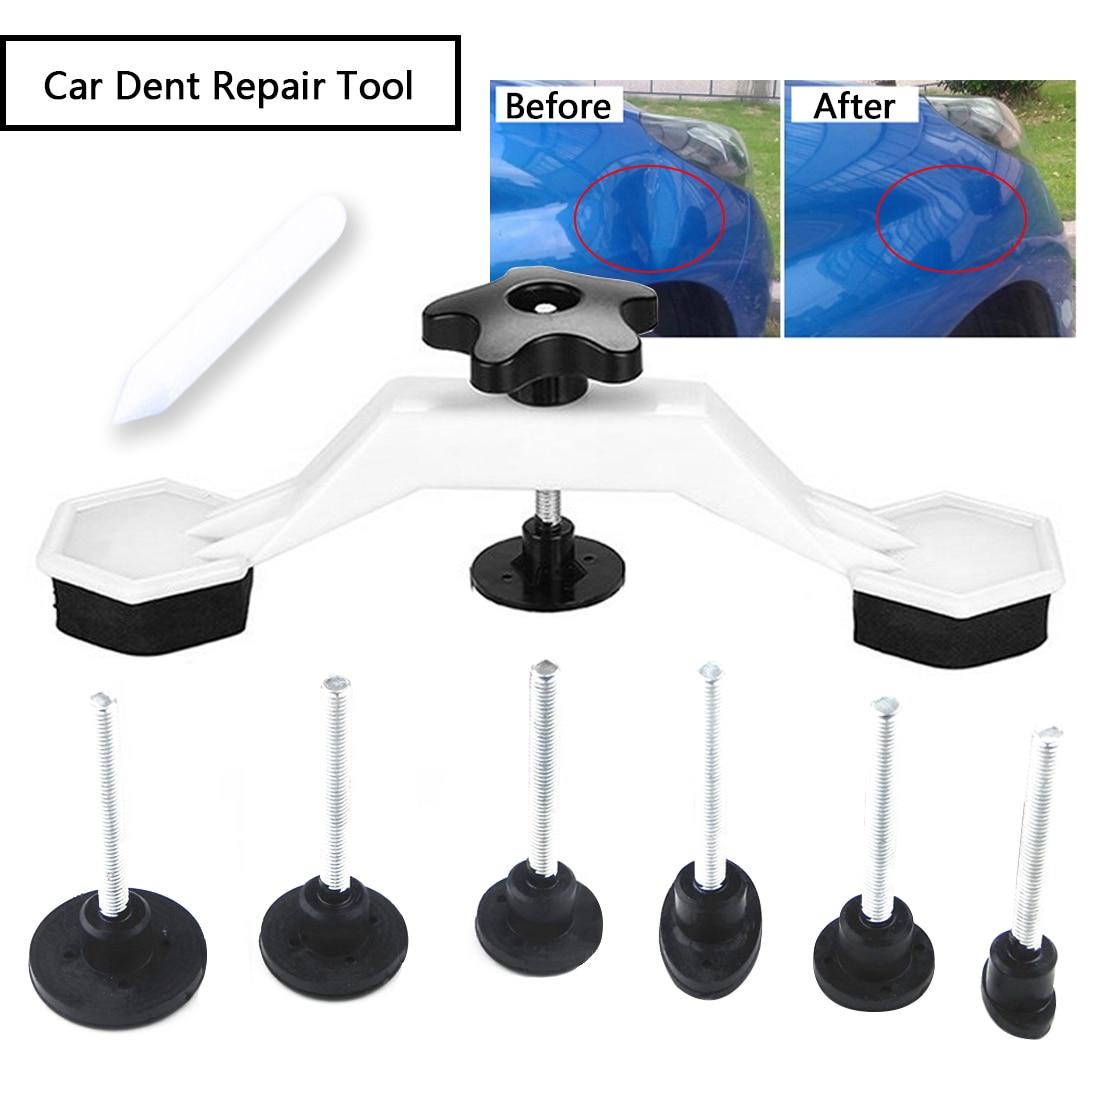 Fix Dent Repair Tool Kit 8pcs Instrument Paintless Auto Car Body Damage Pulling Bridge Removal Glue Tab Tool Hand Tool Set Newly(China)